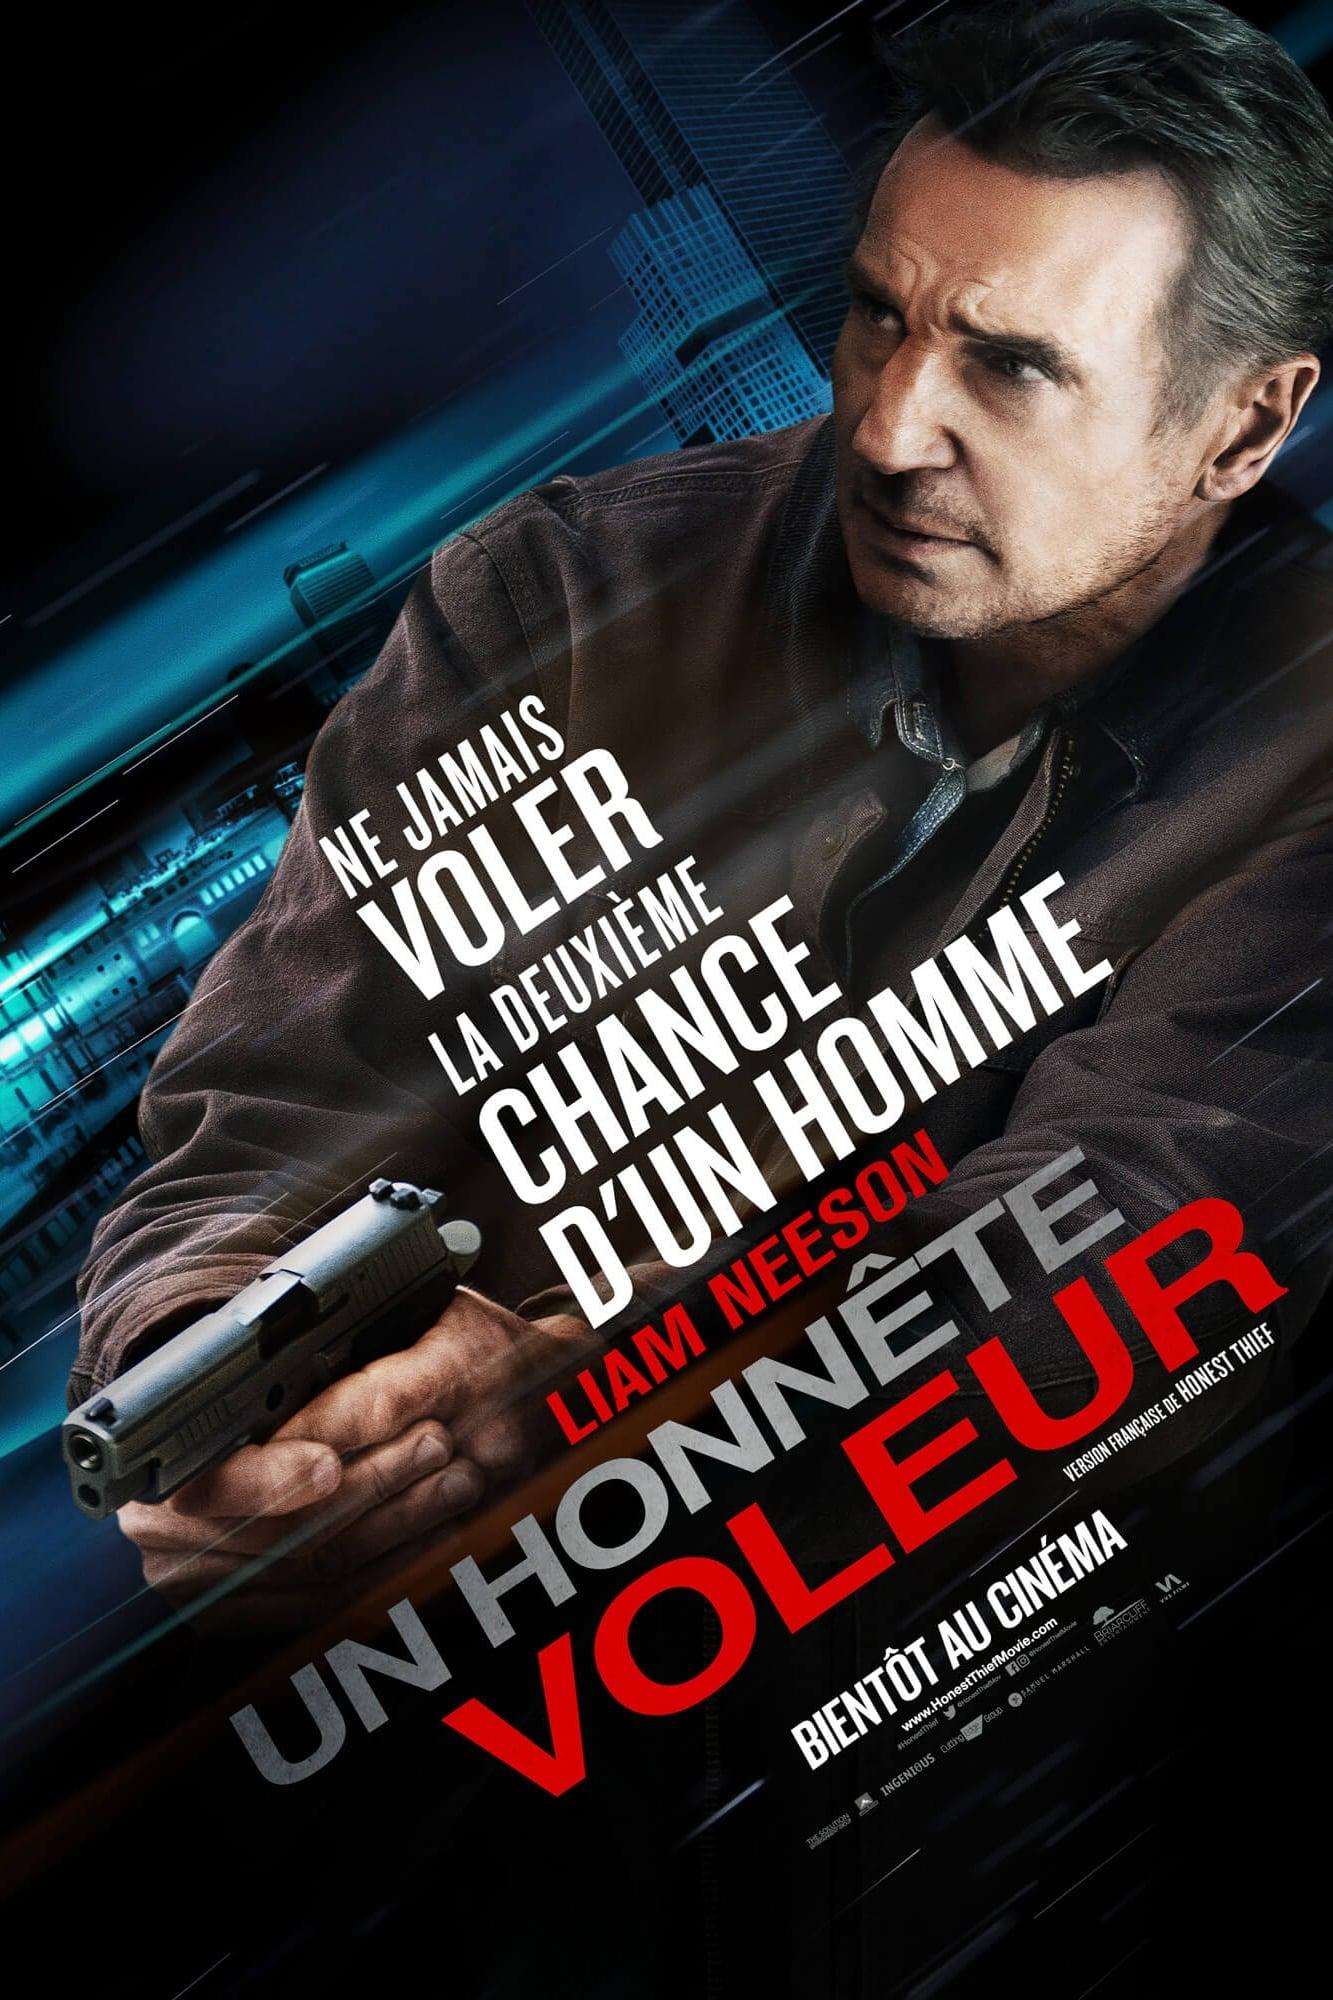 The Good Criminal - Honest Thief (HD CAM) 2020Film streaming gratuit (free)